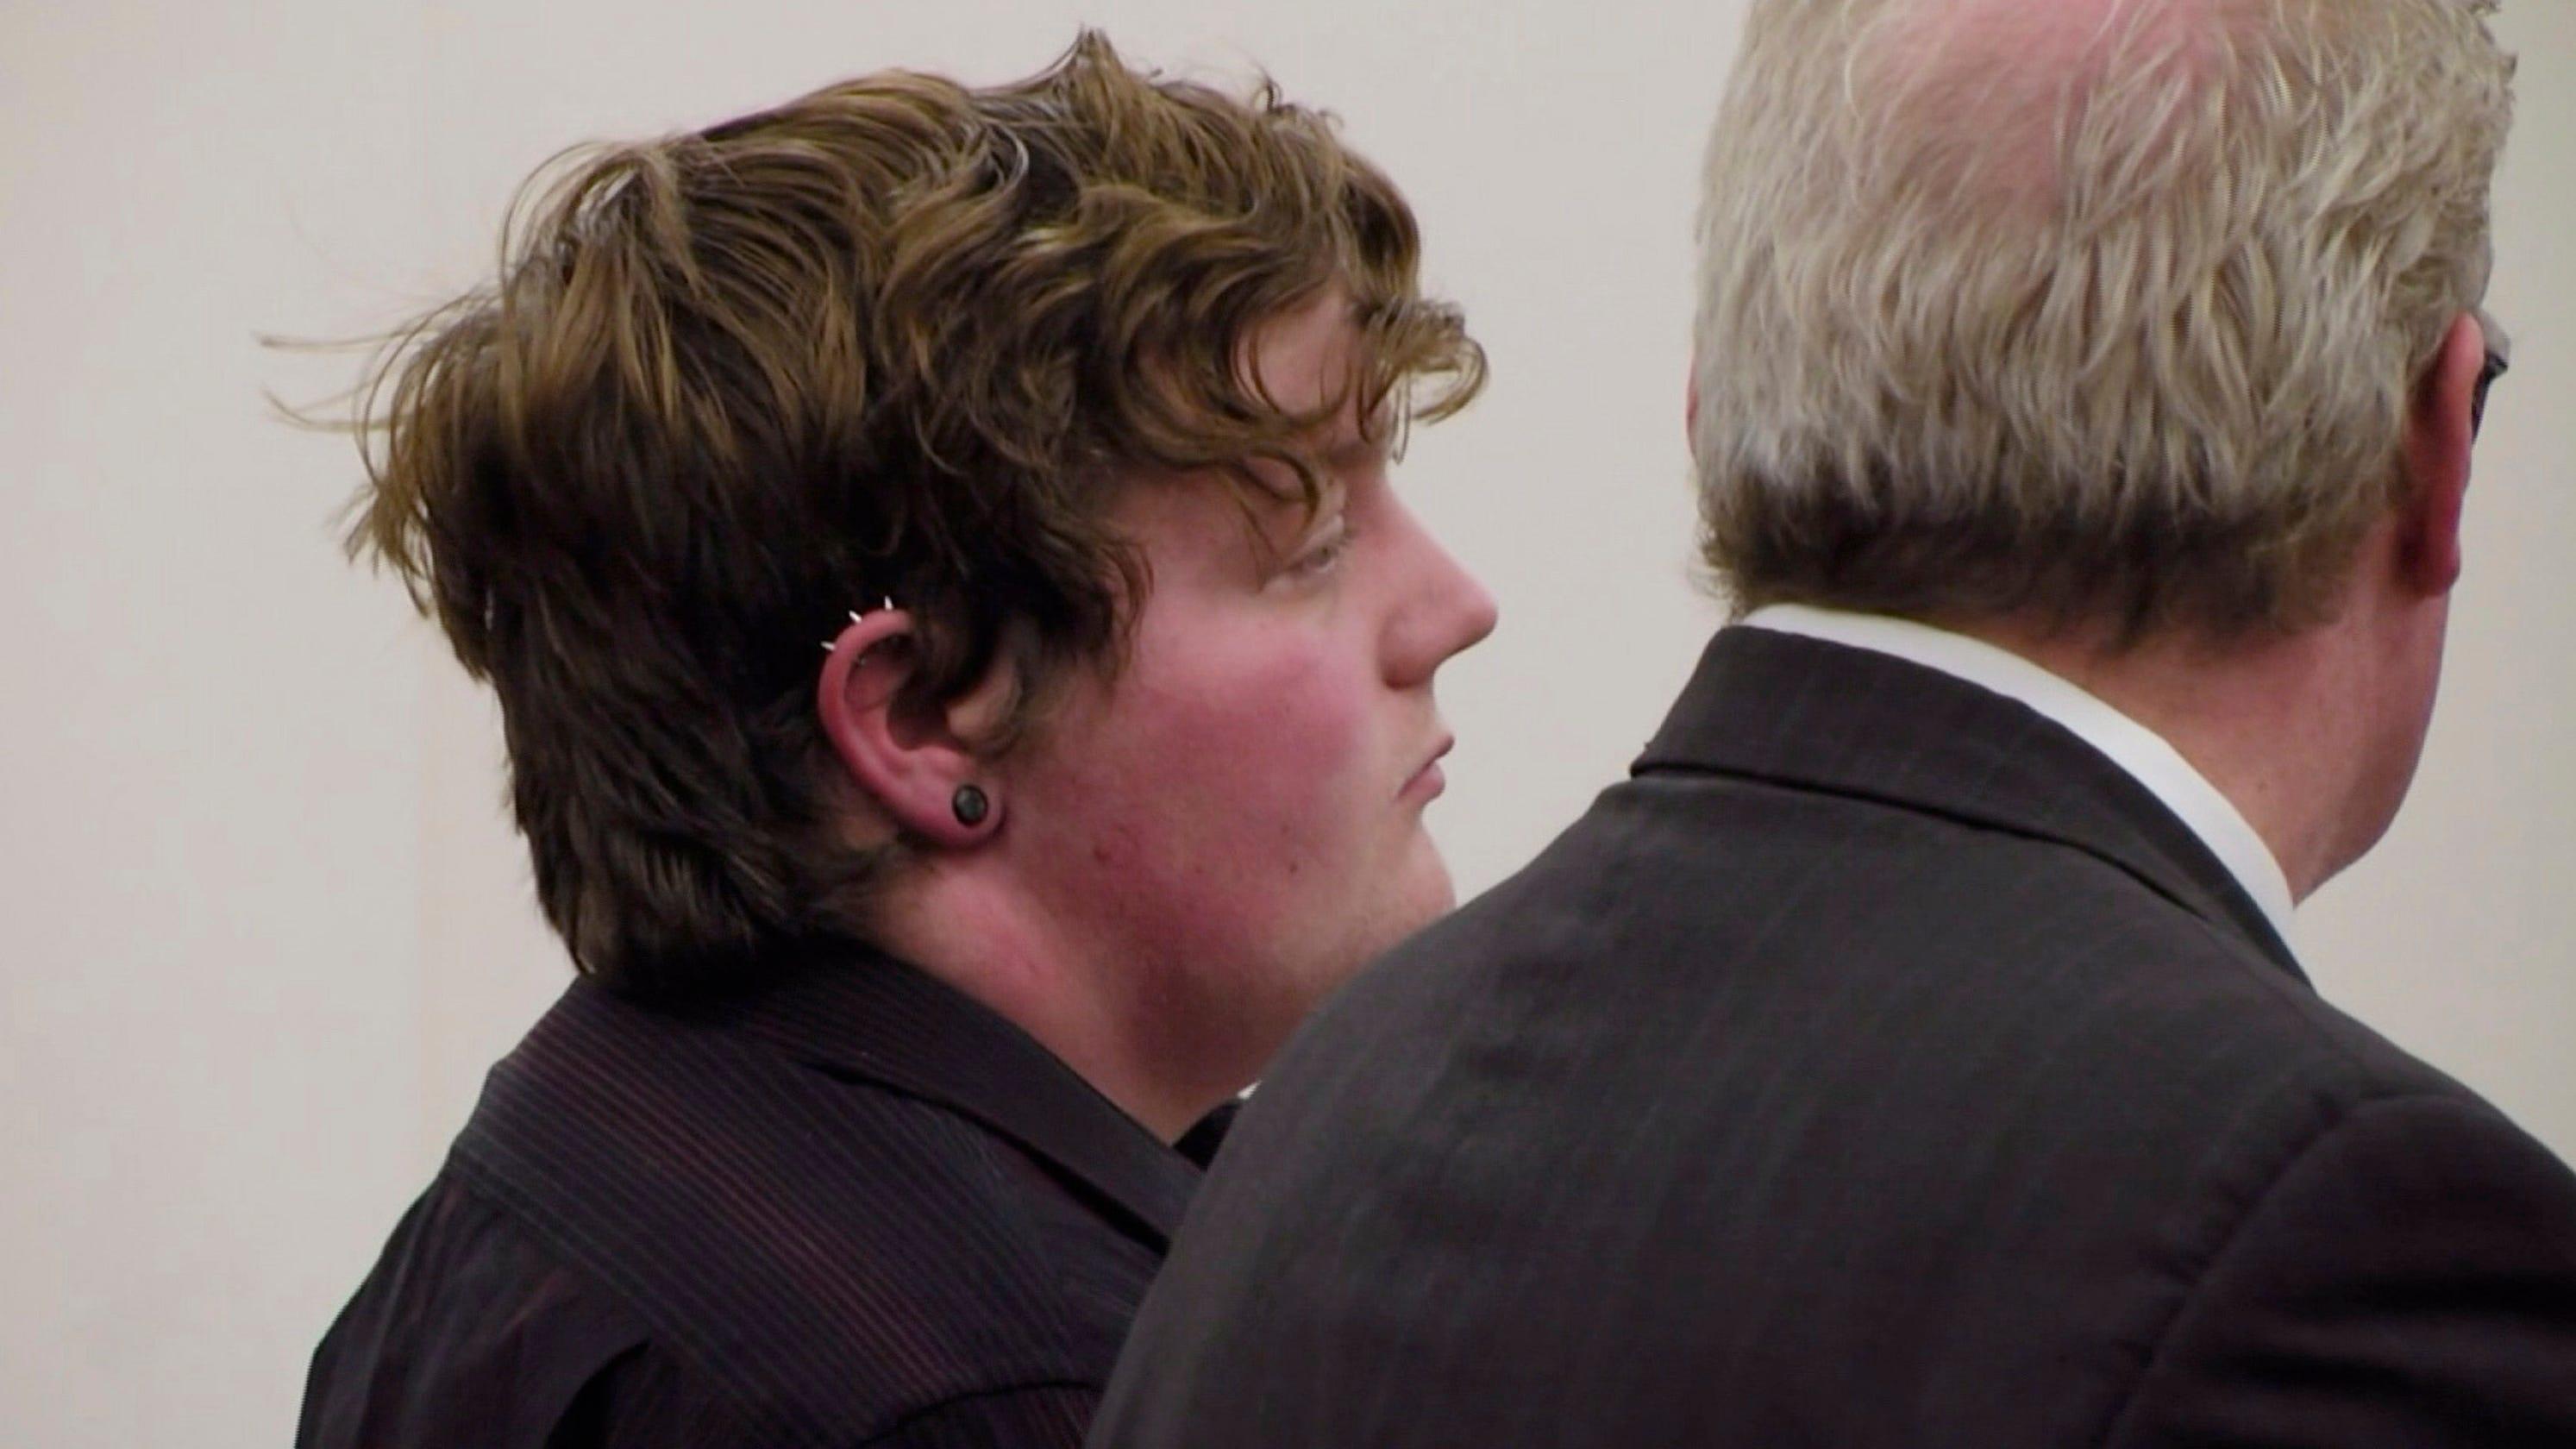 Bus driver Shane Piche won't go to prison for rape  He's not alone